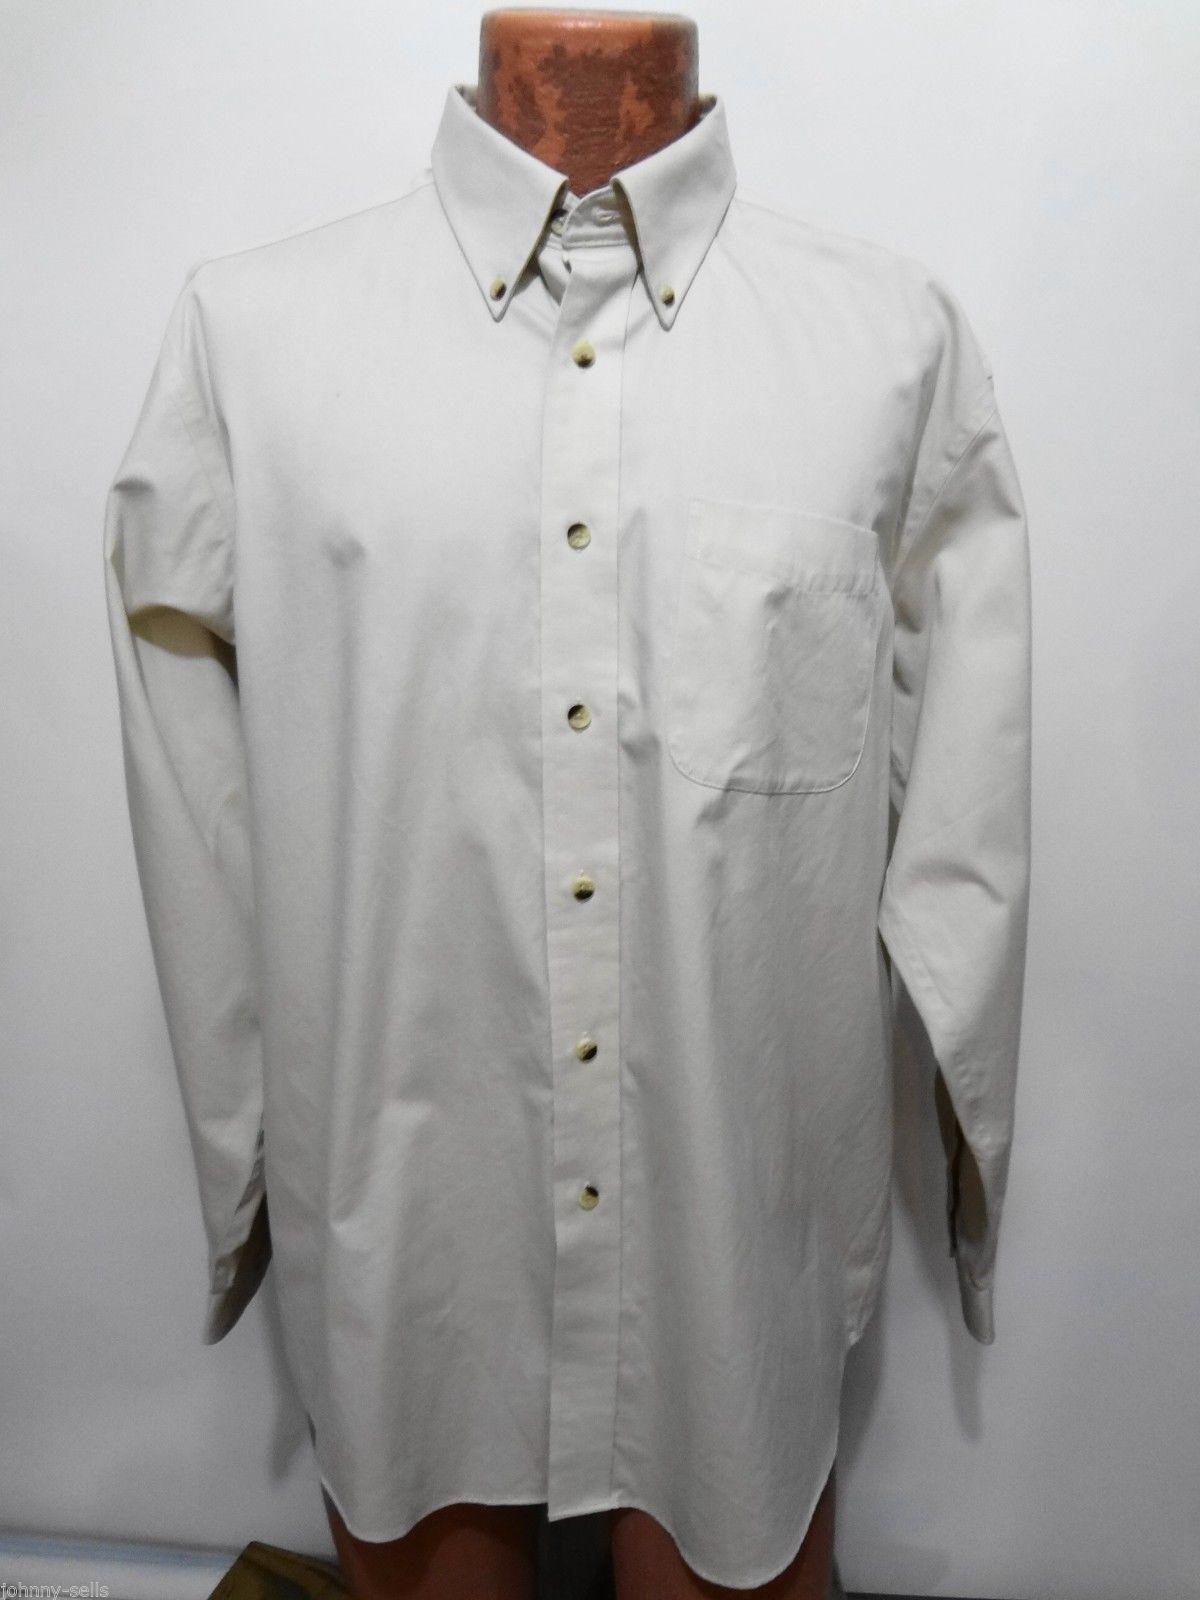 Ll bean beige button down long sleeve cotton shirt mens l for Ll bean wrinkle resistant shirts